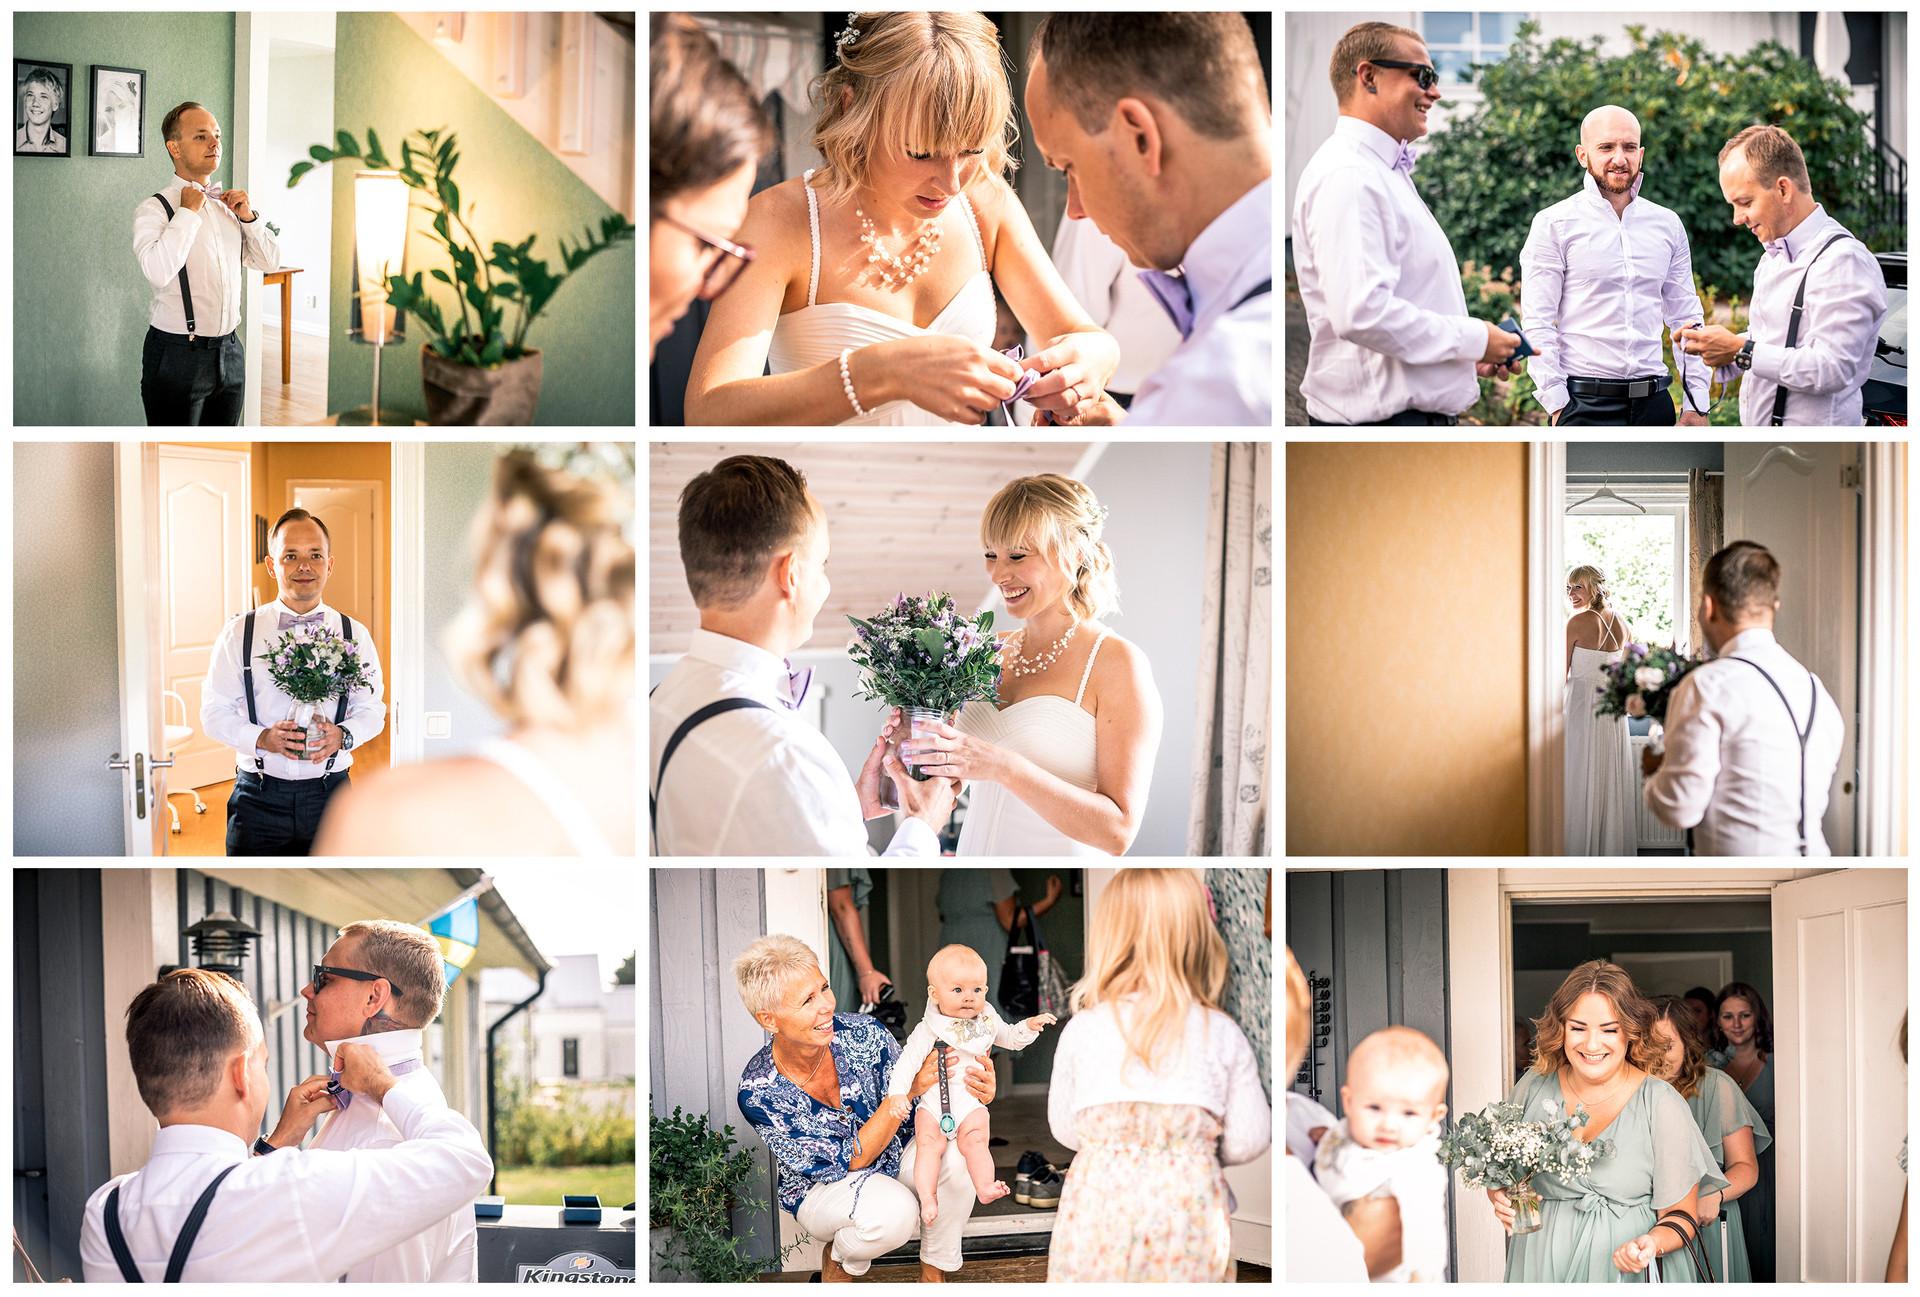 Wedding-Photography-Goteborg-05.jpg